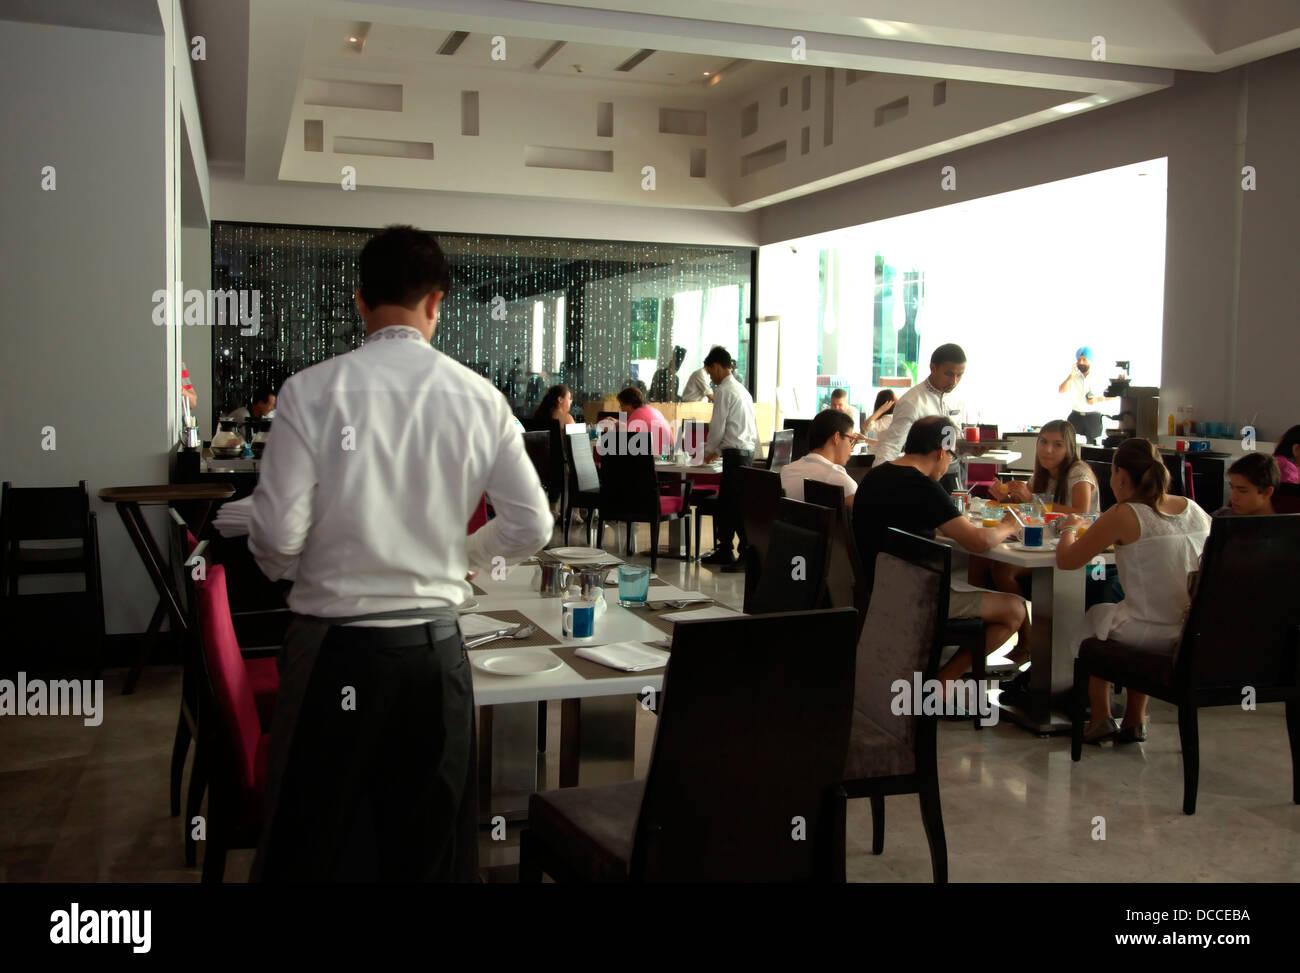 Restaurant,People,Dining,Hotel Radisson Blu,Agra,India,coffee shop,food,eating - Stock Image